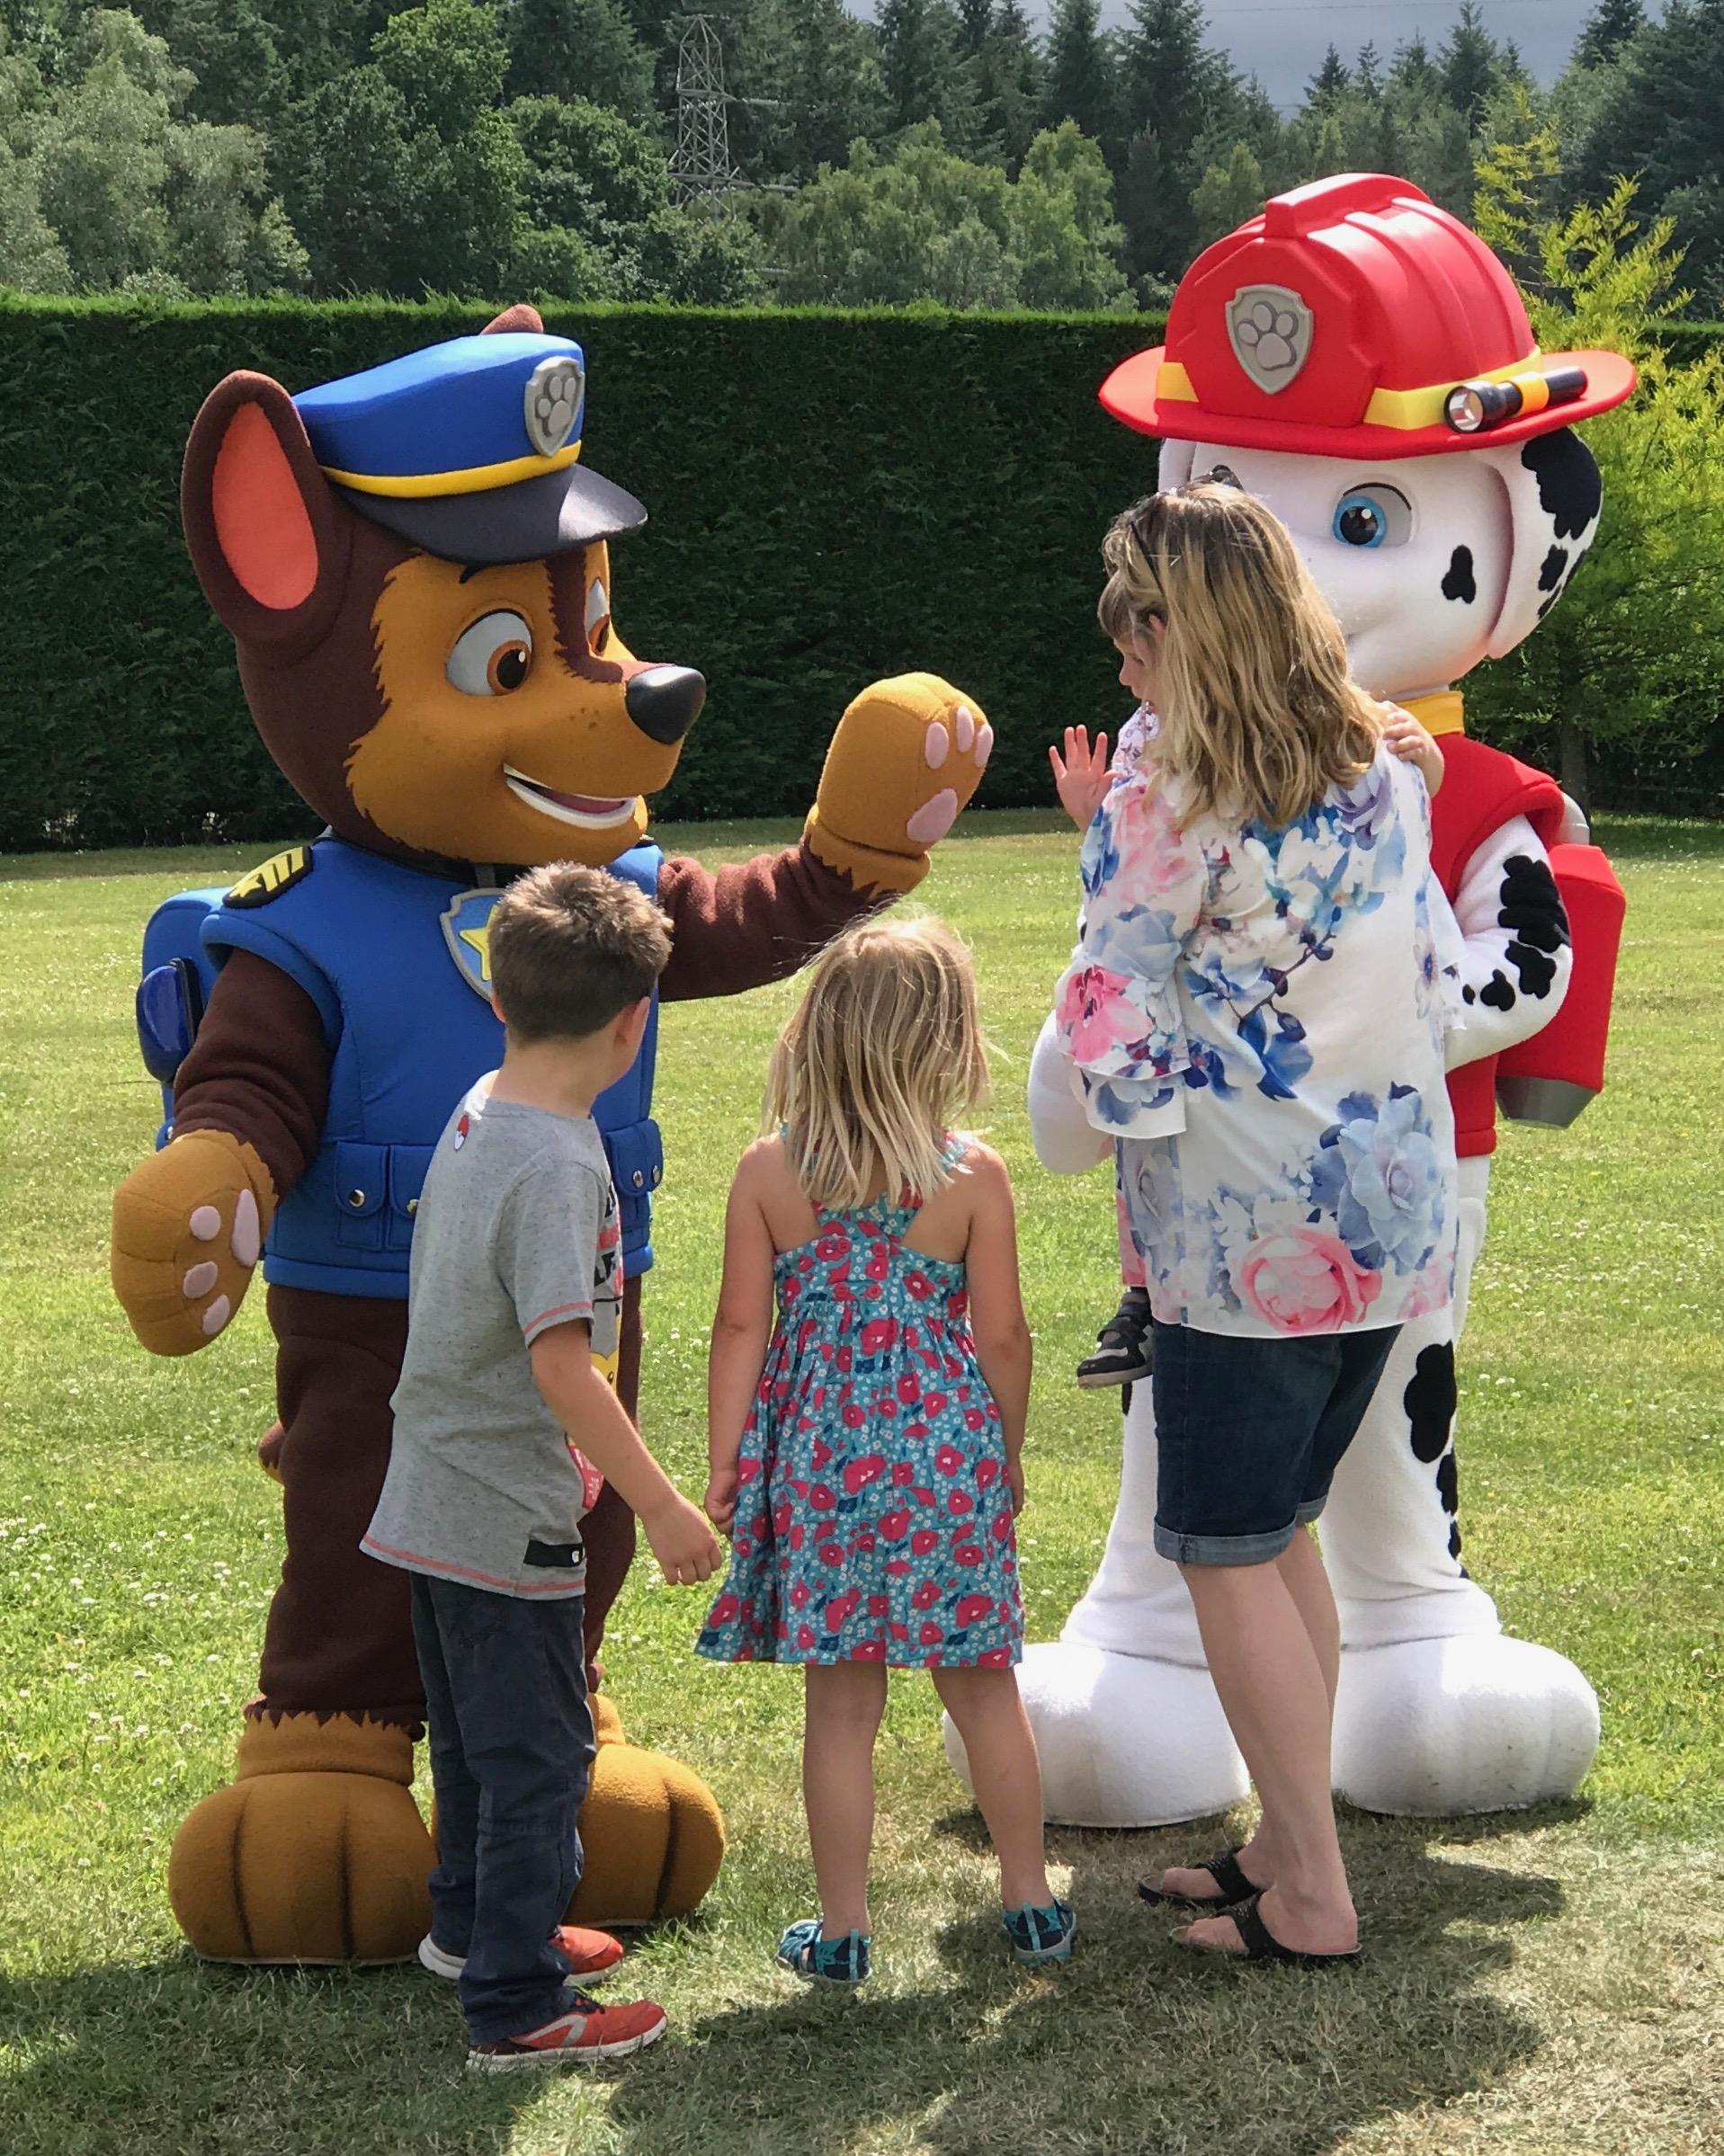 Paw Patrol at Paultons Park